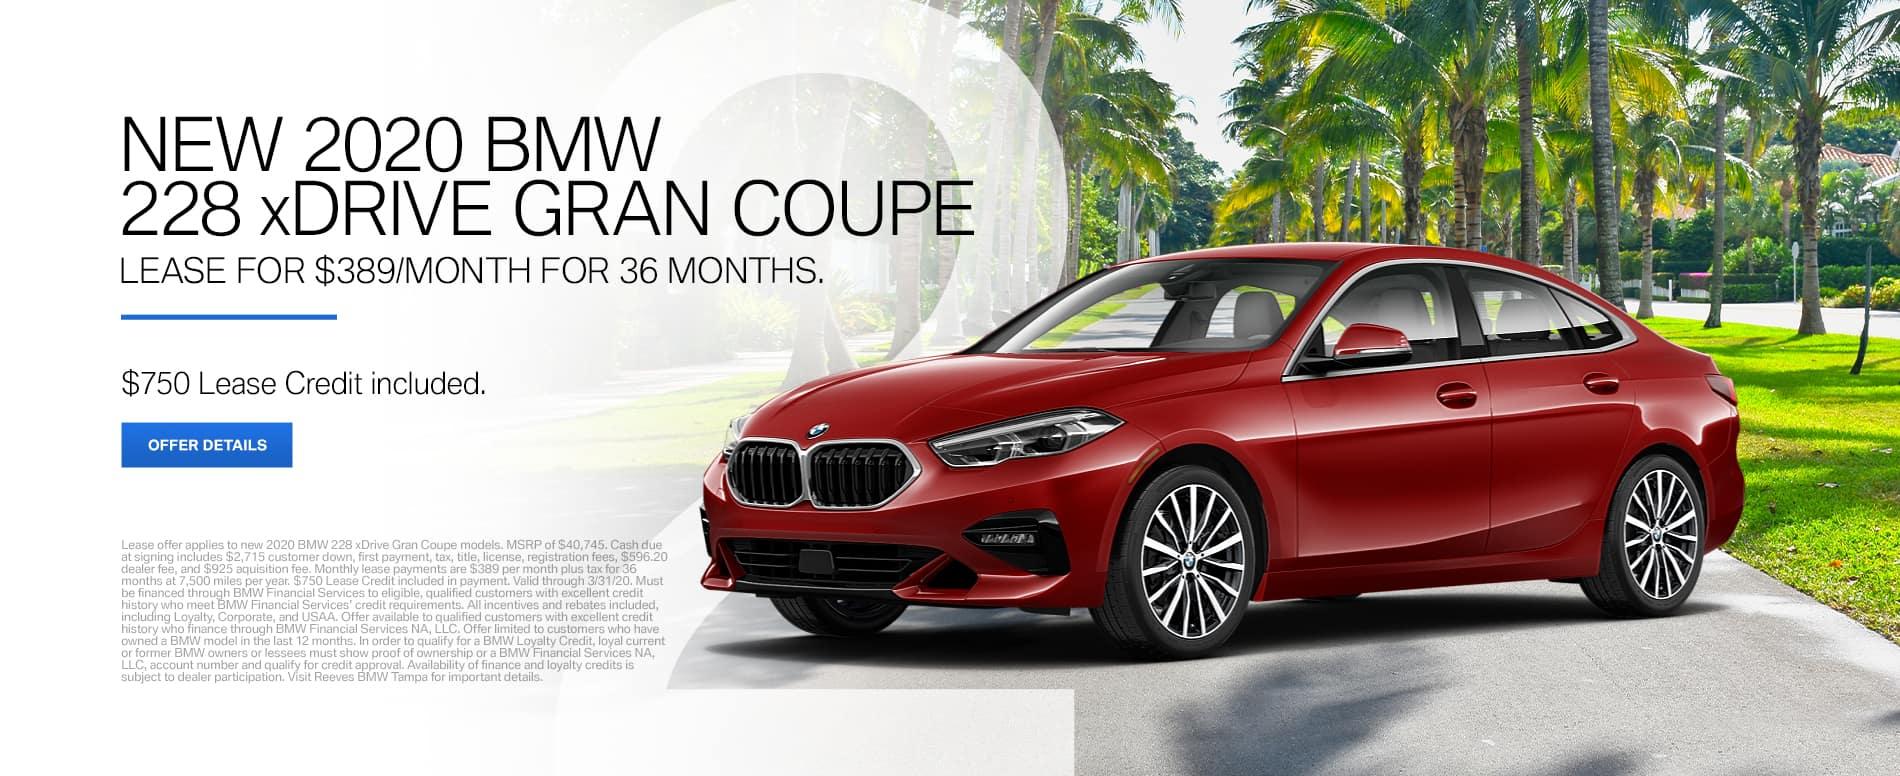 2020 BMW 228